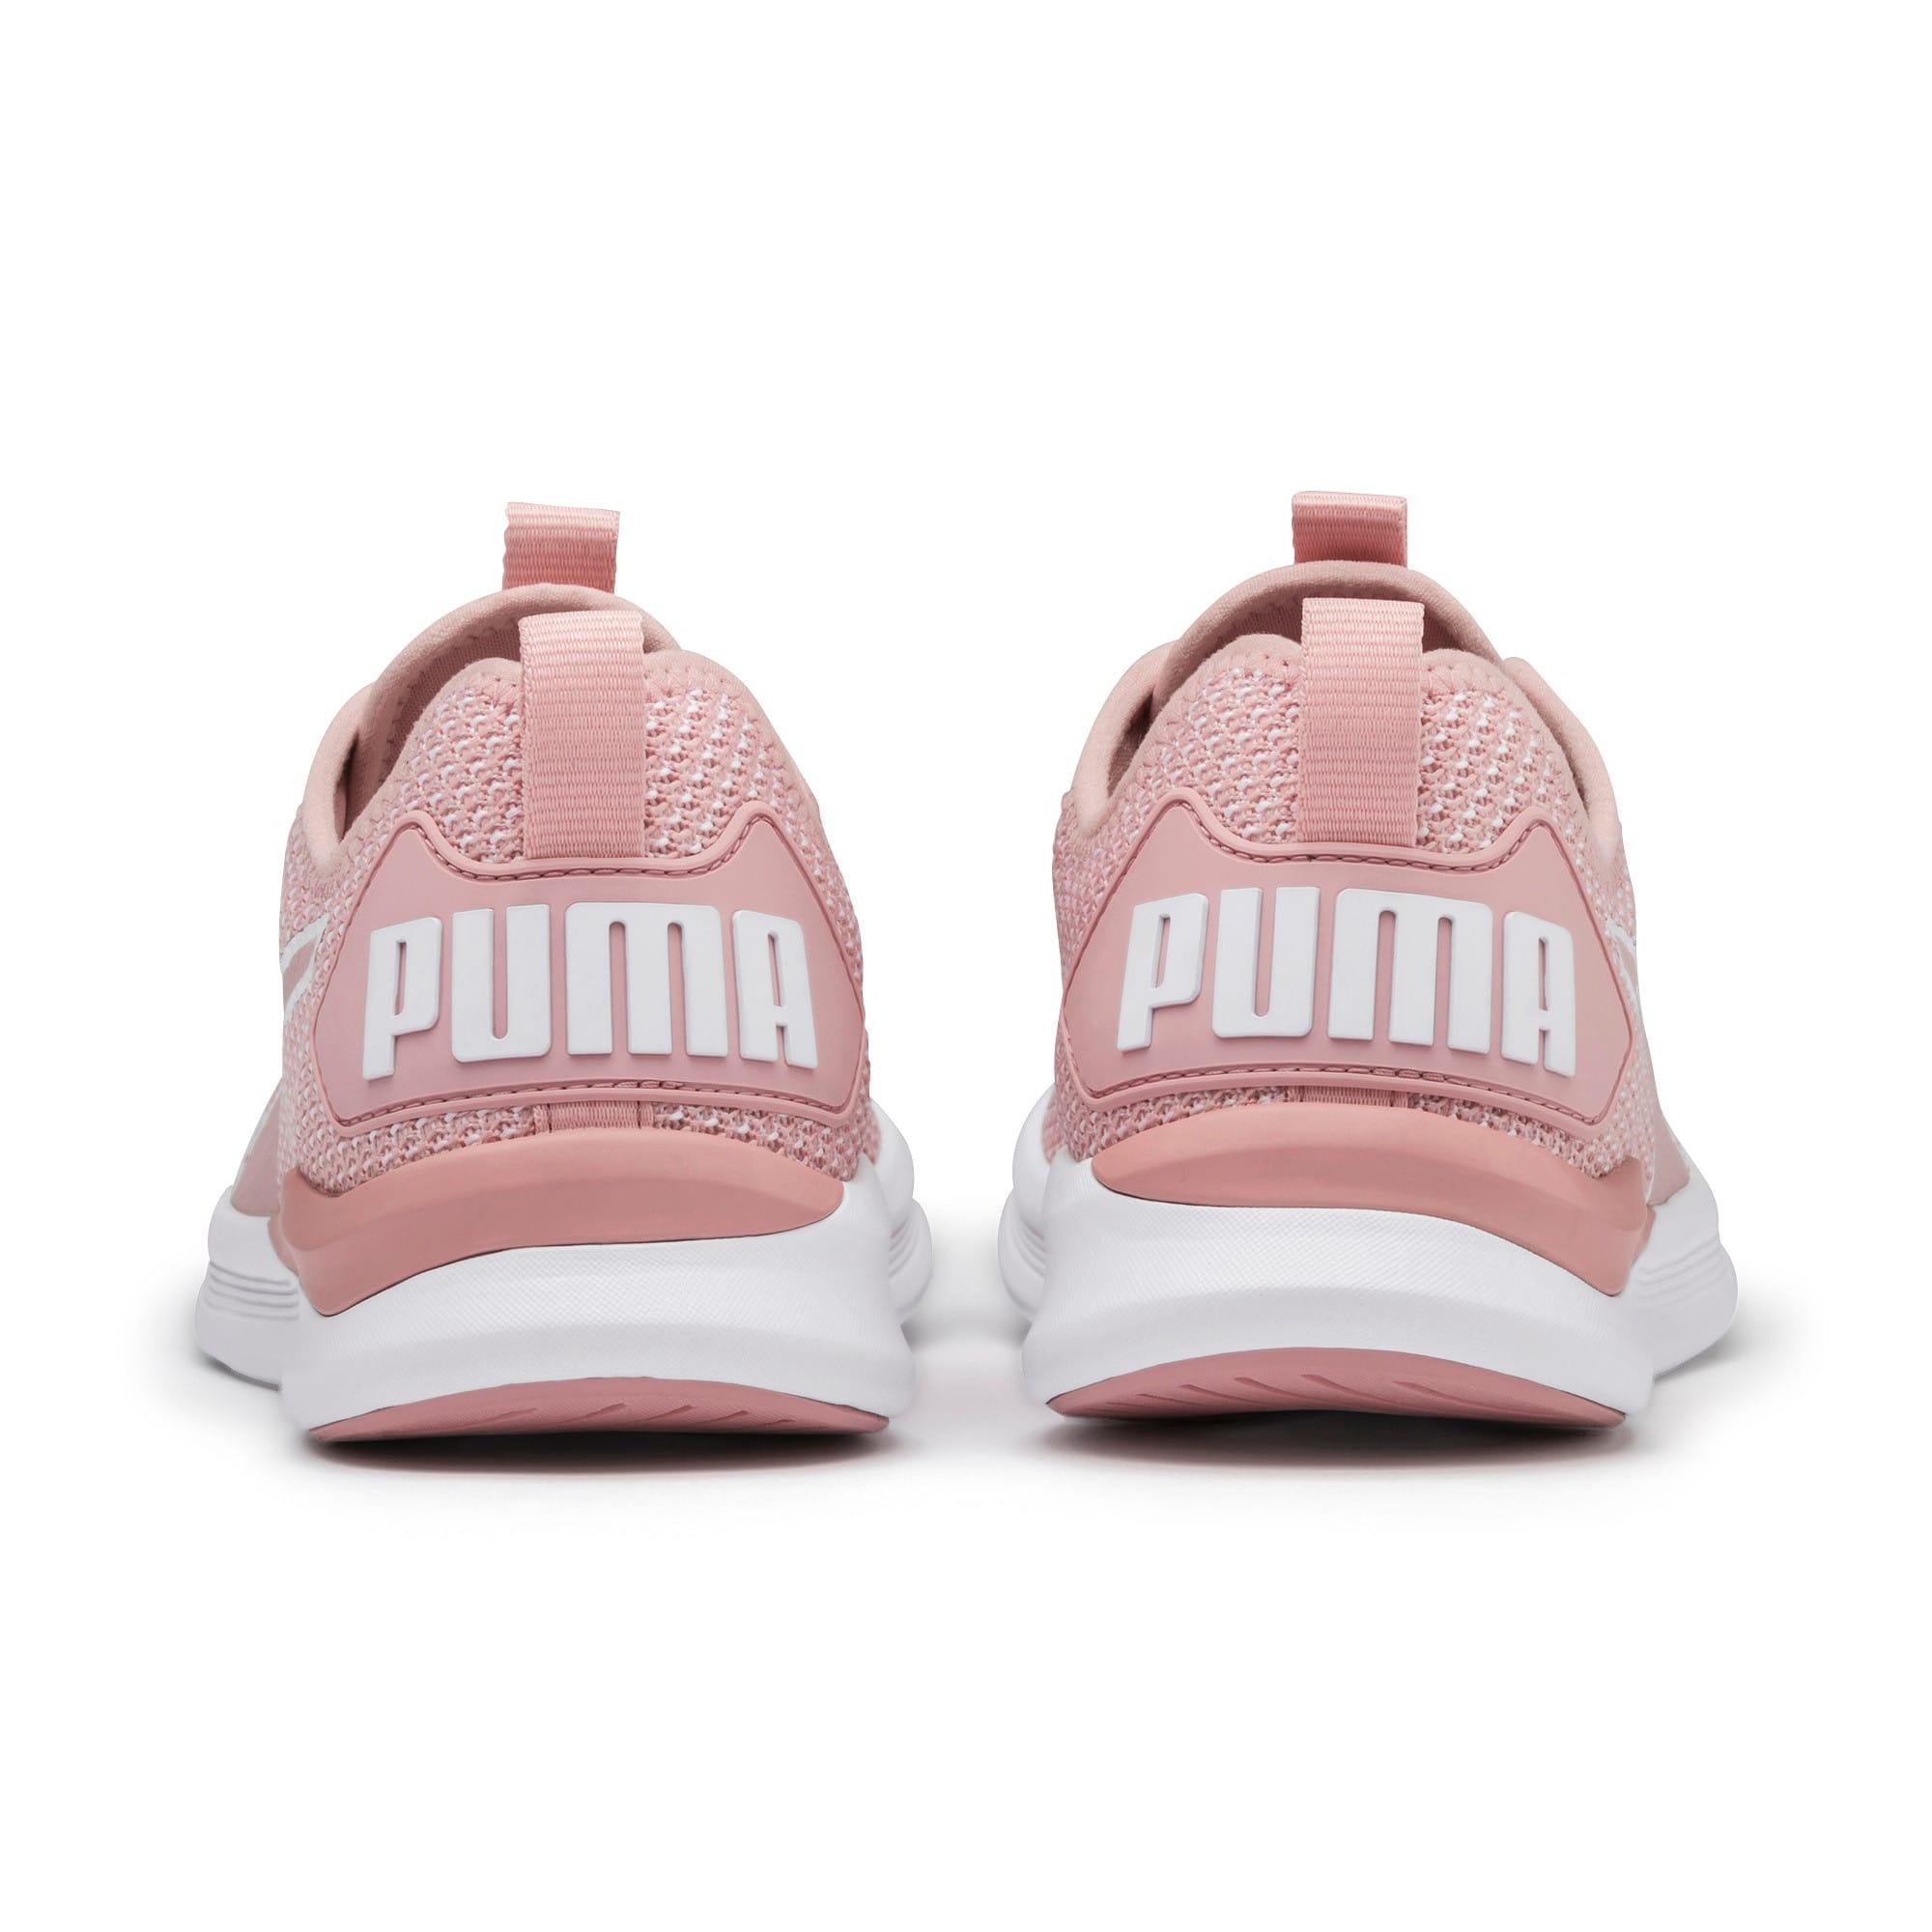 Thumbnail 4 of IGNITE Flash Women's Training Shoes, Bridal Rose-Puma White, medium